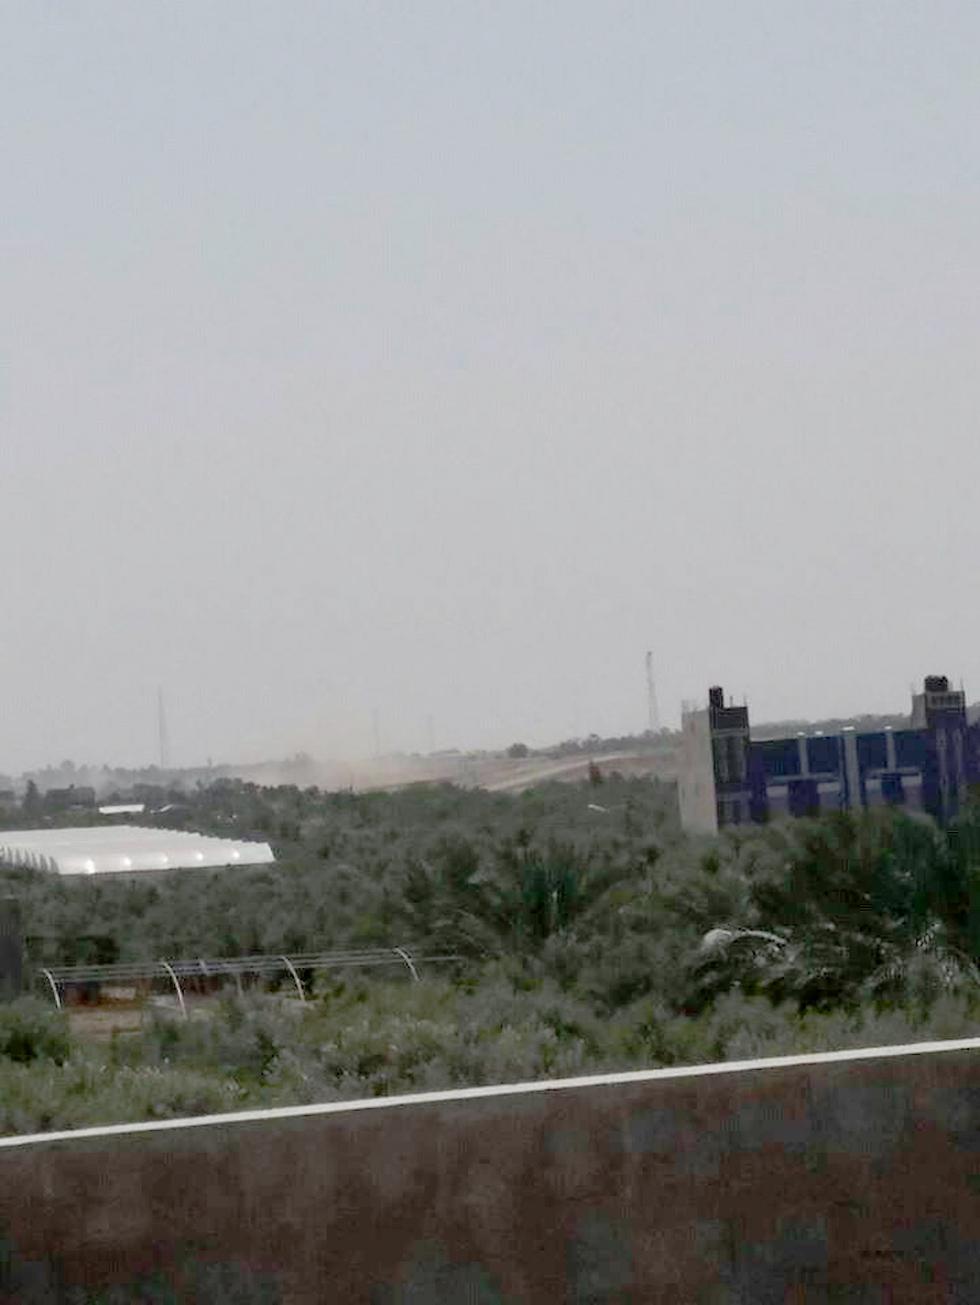 Hamas position hit by IDF tanks